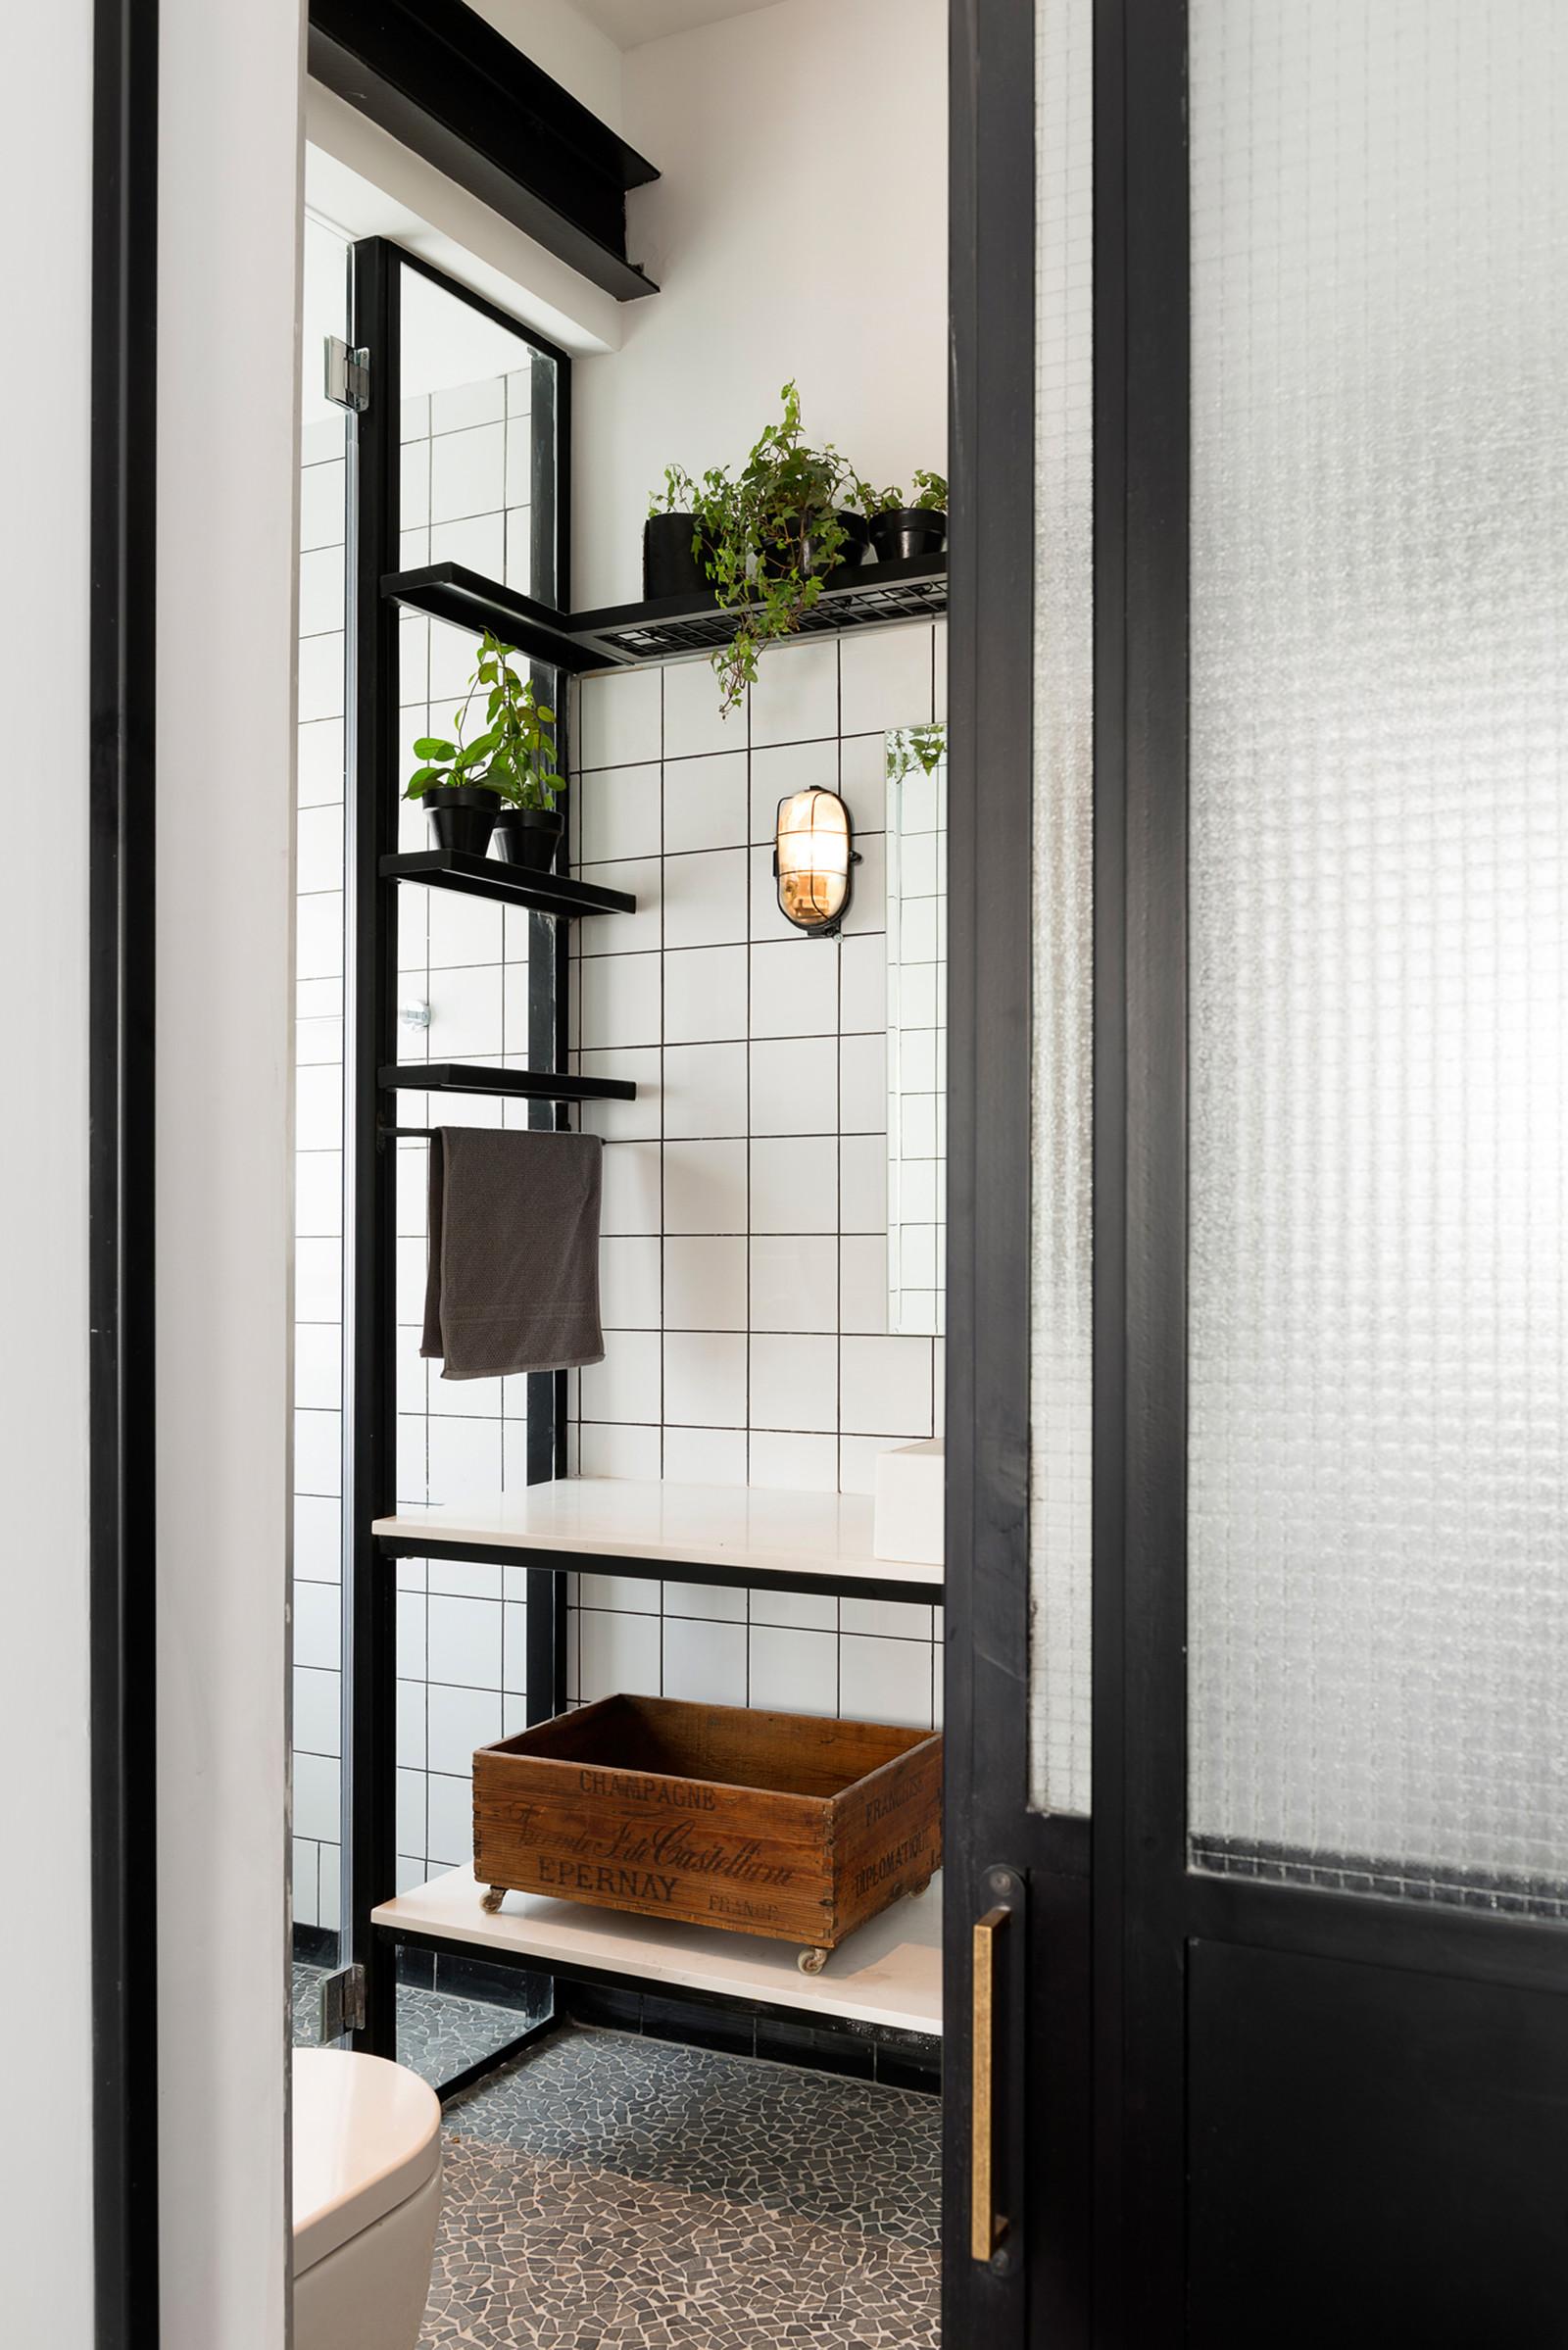 Apartment-renovation-just3ds.com-20